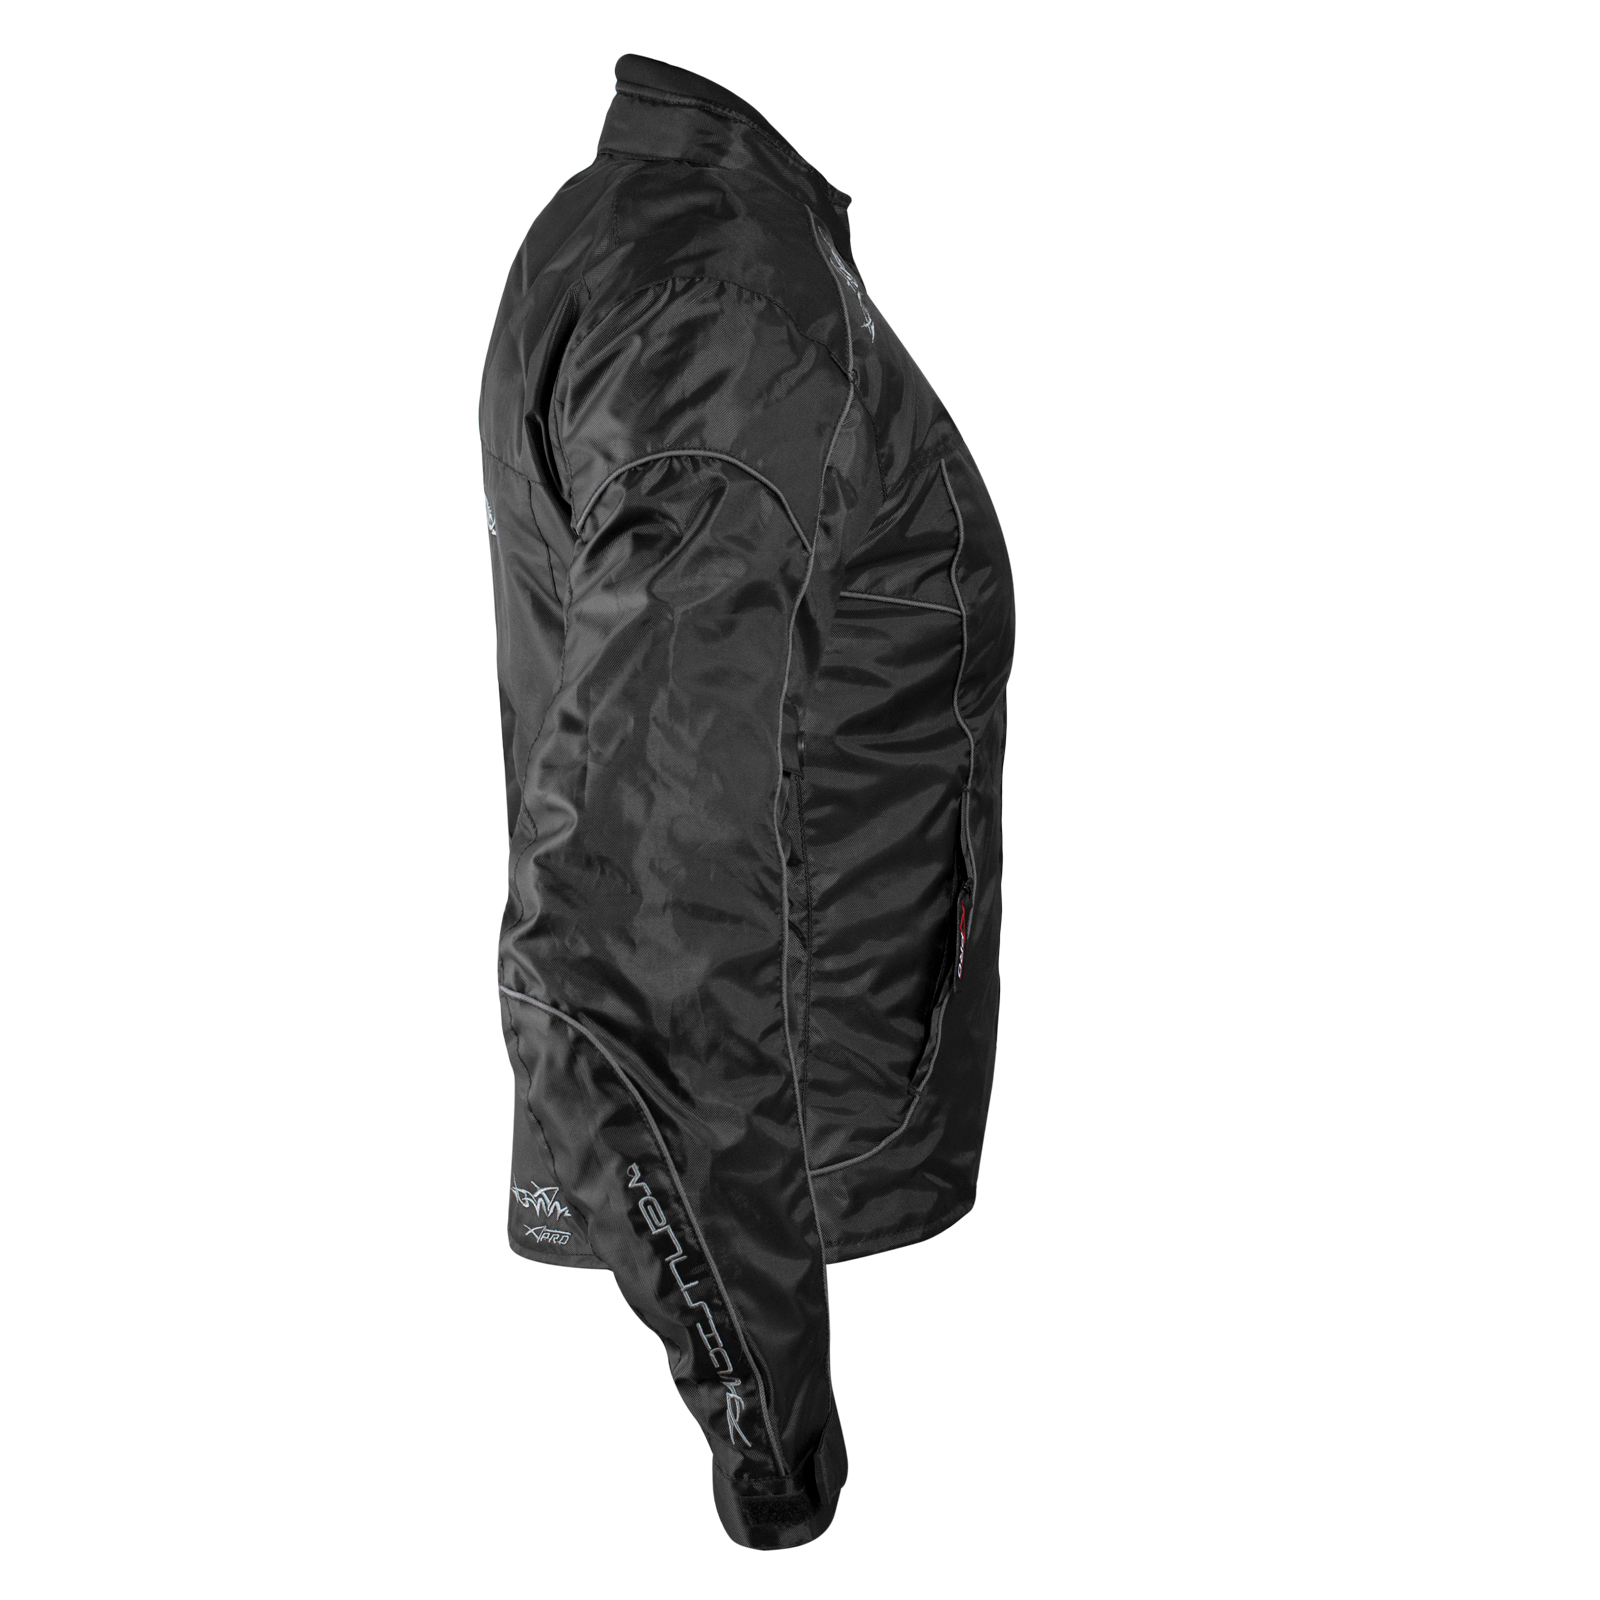 Giacca-Lady-Moto-Donna-Tessuto-Protezioni-CE-Termico-Sfoderabile-Scooter miniatura 7